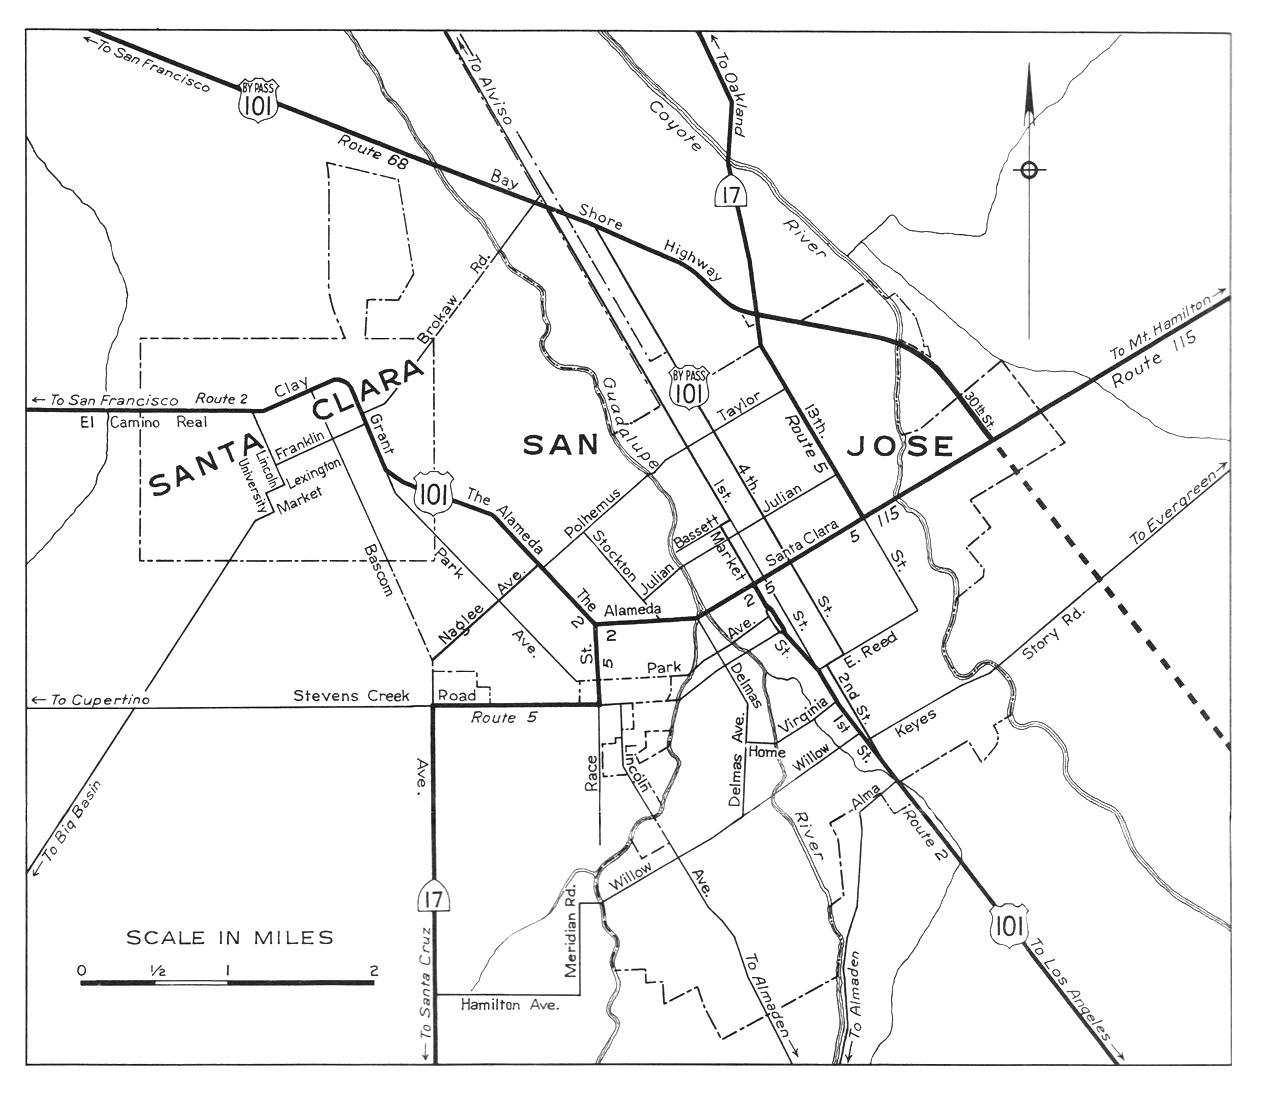 California City Maps At AmericanRoadscom - City map of california